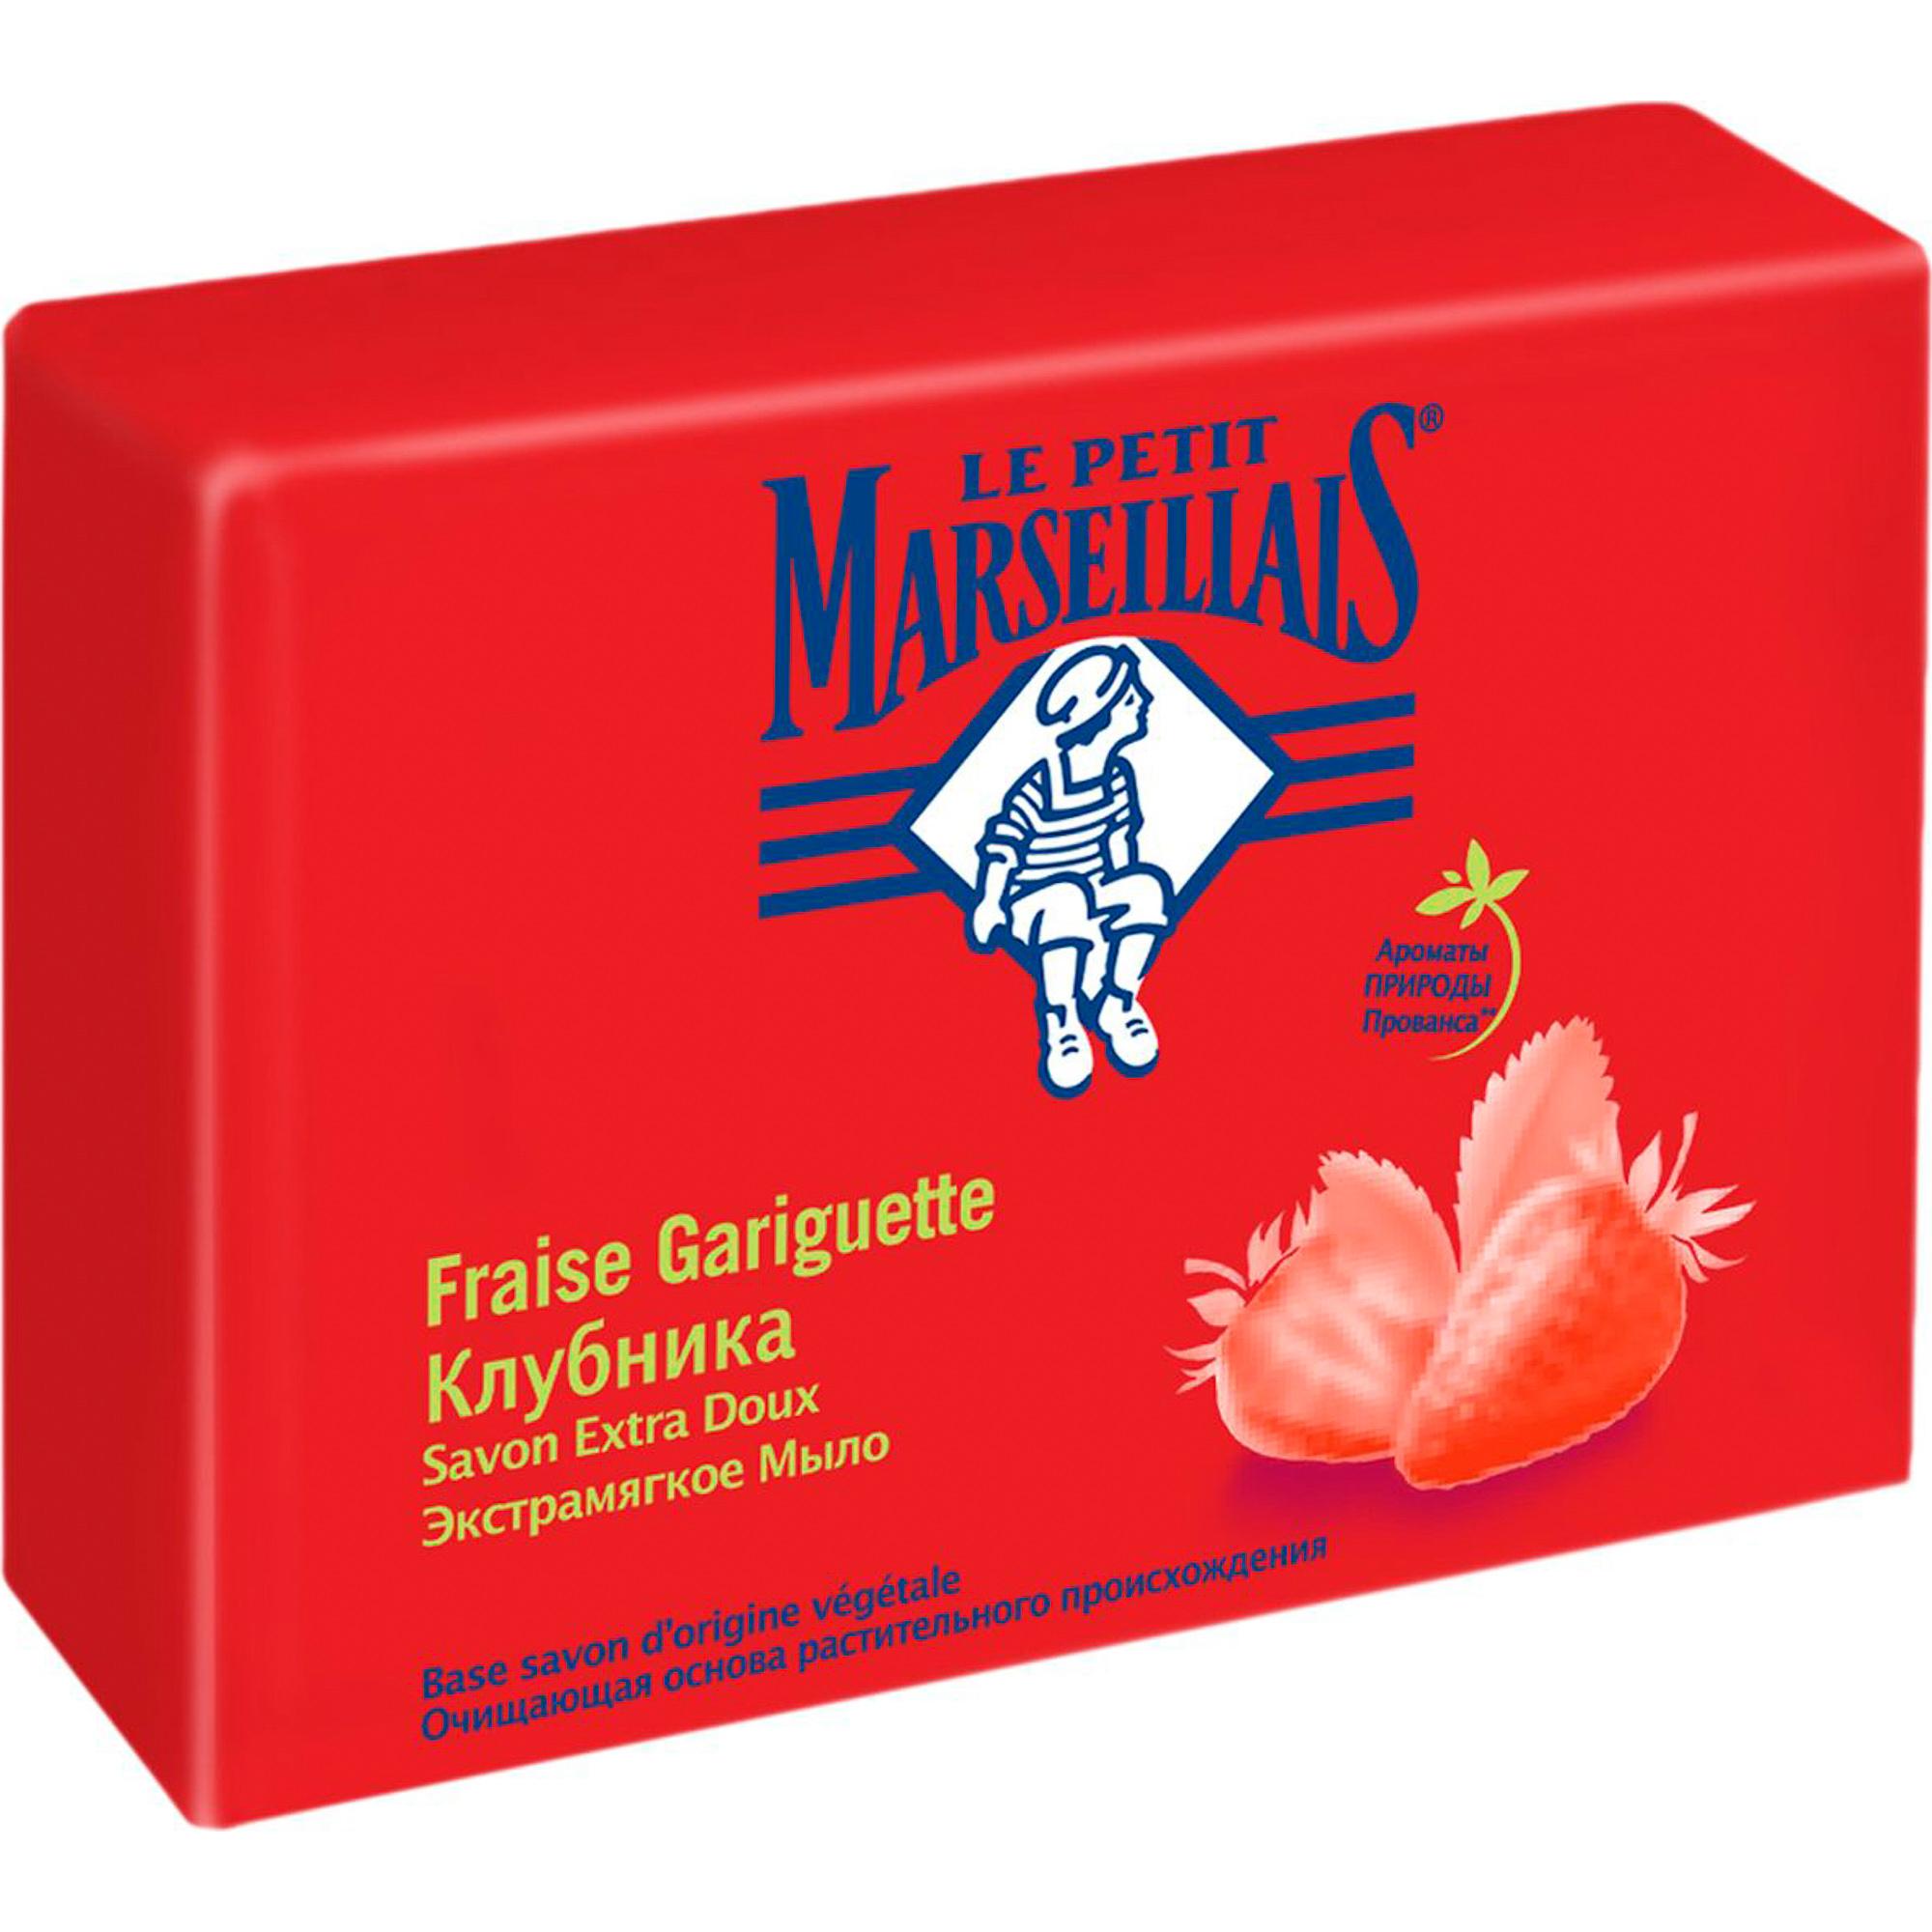 Мыло Le Petit Marseillais Клубника 90 г